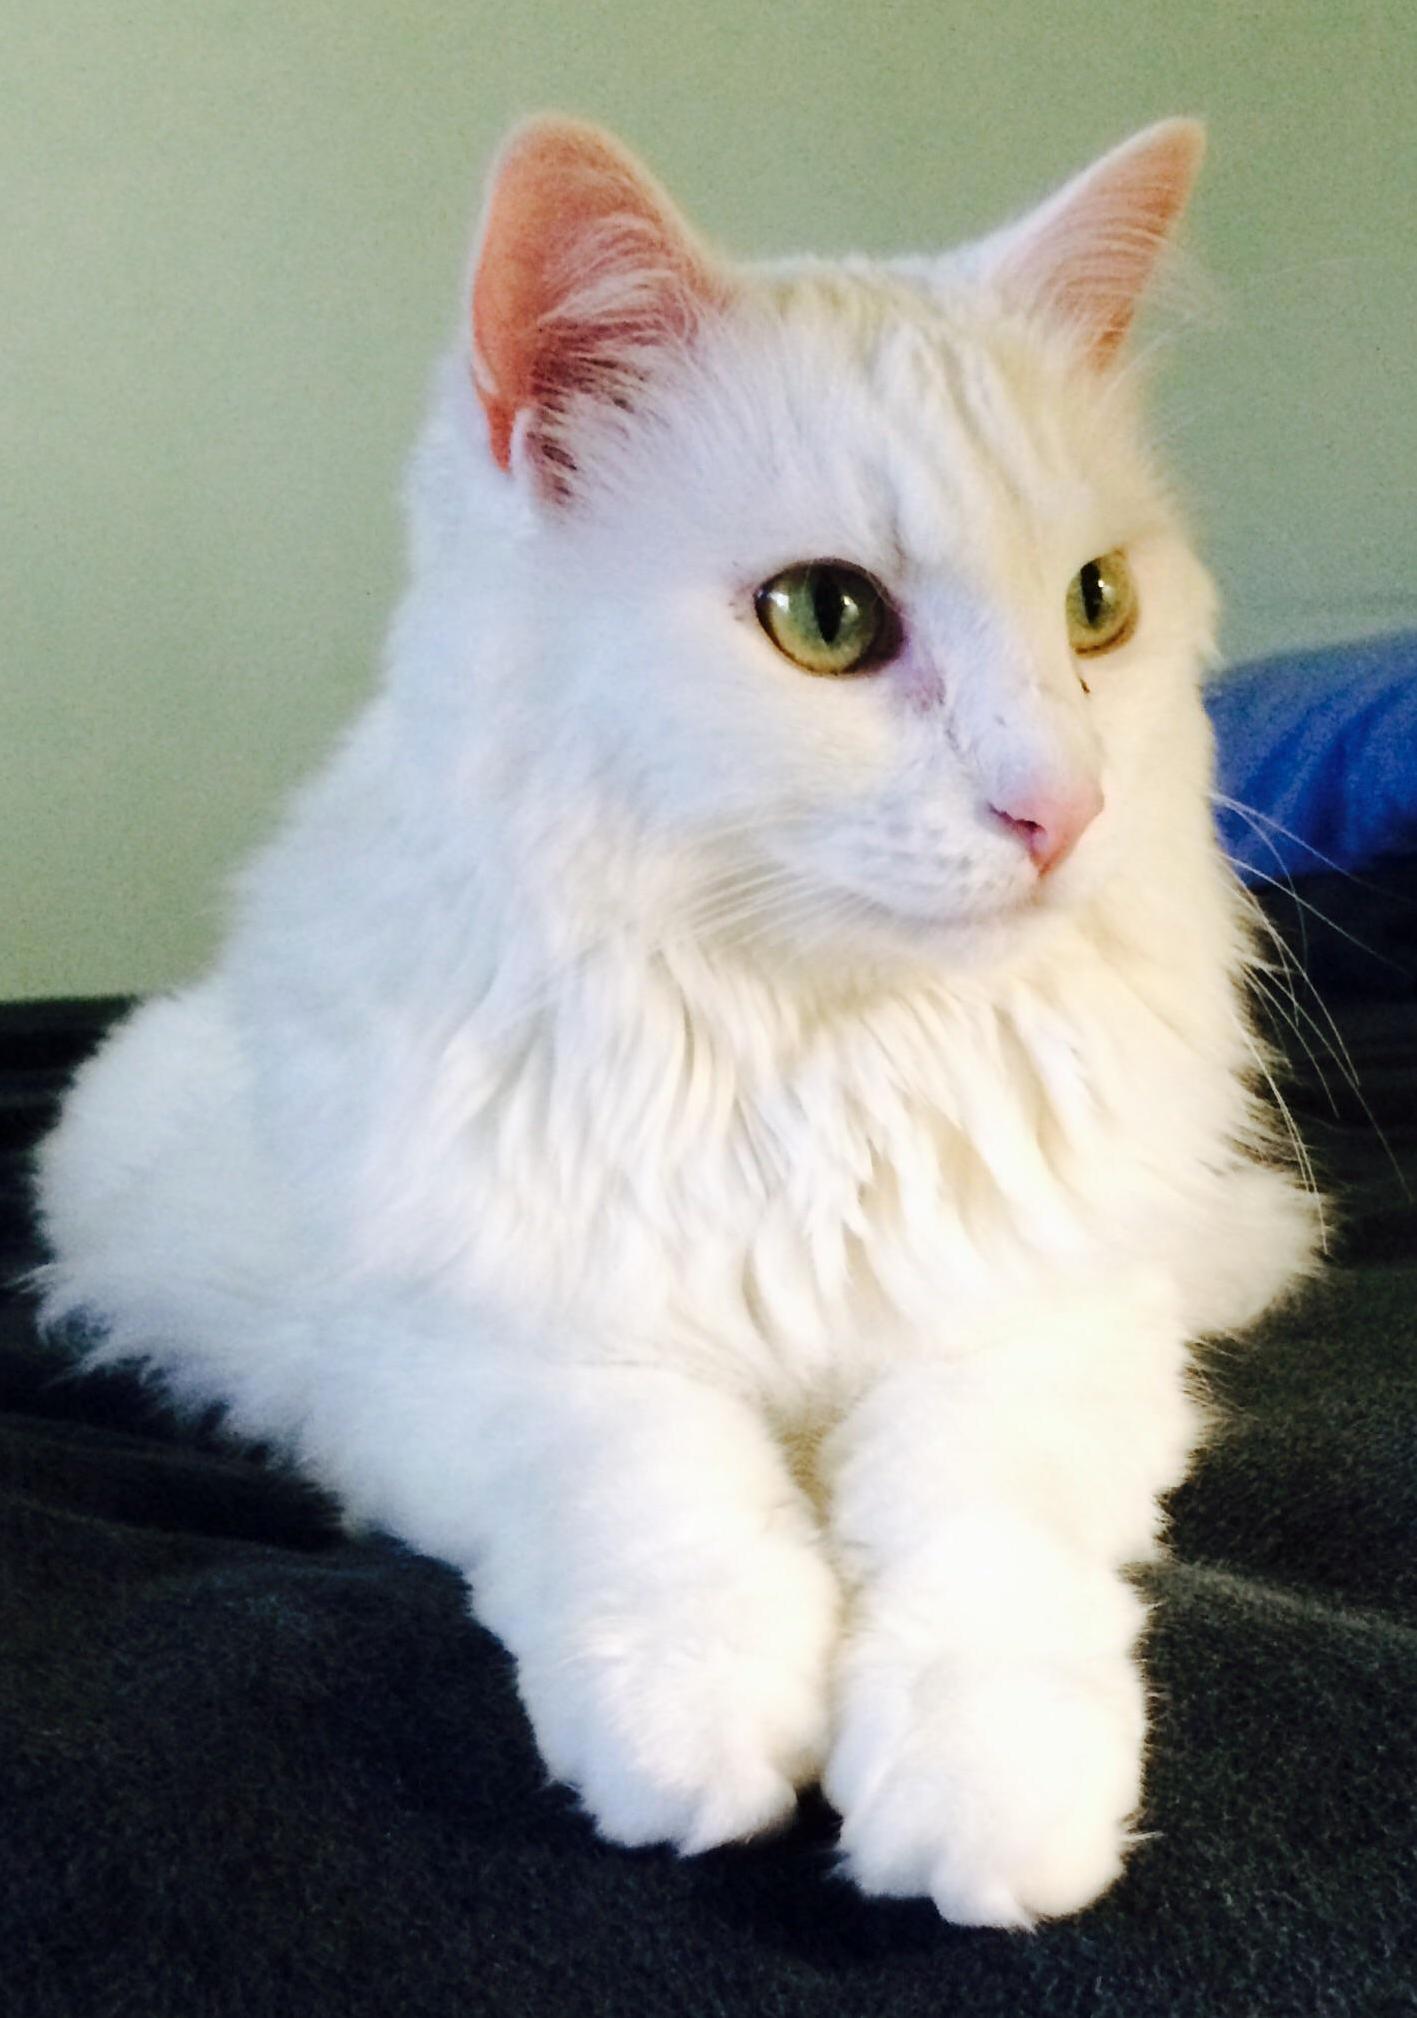 Meet mr. kitty